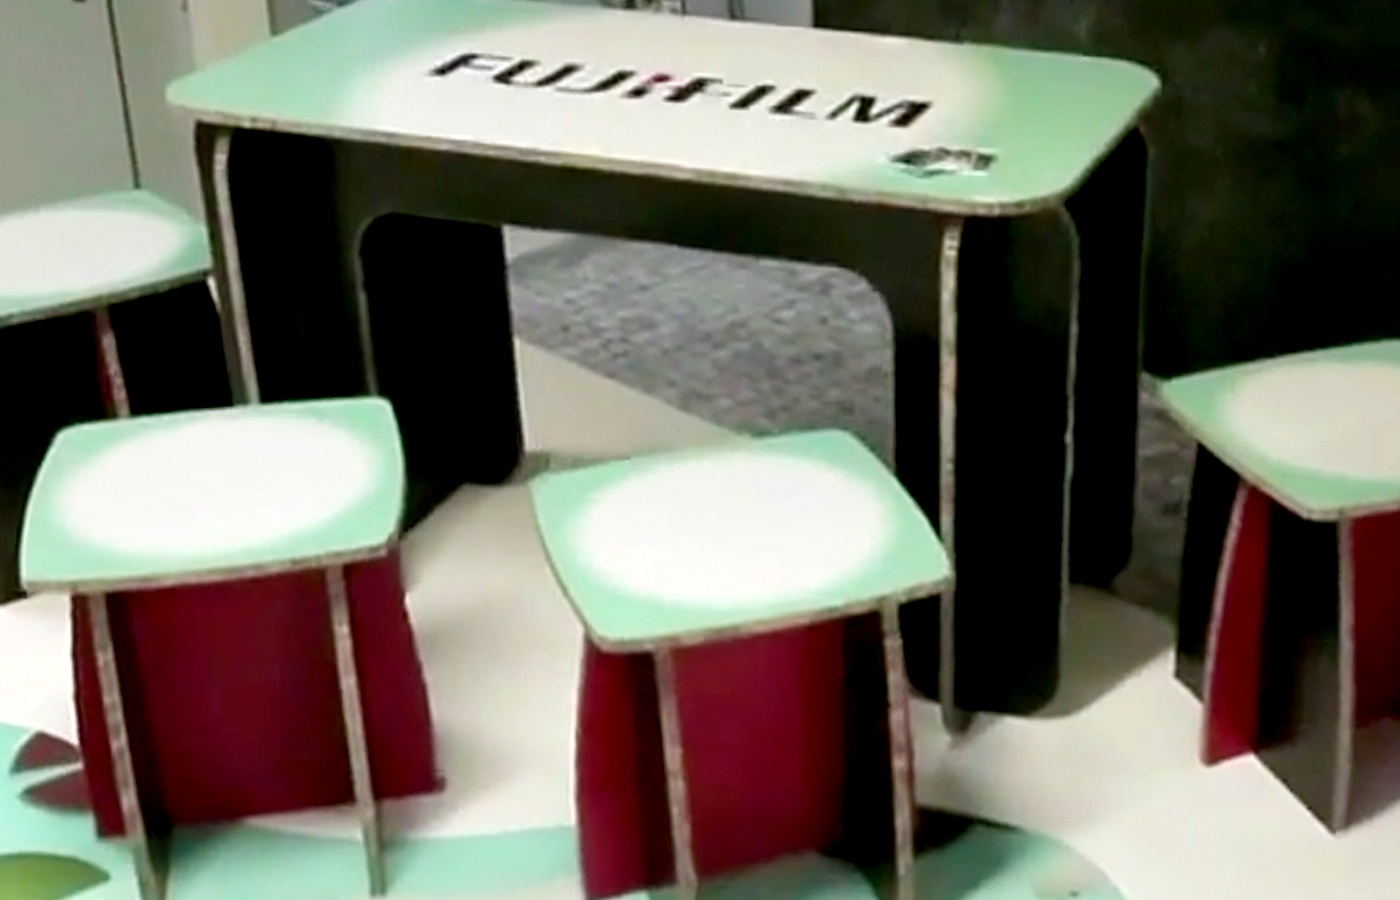 application-rigid-board-table-1400-x-900.jpg